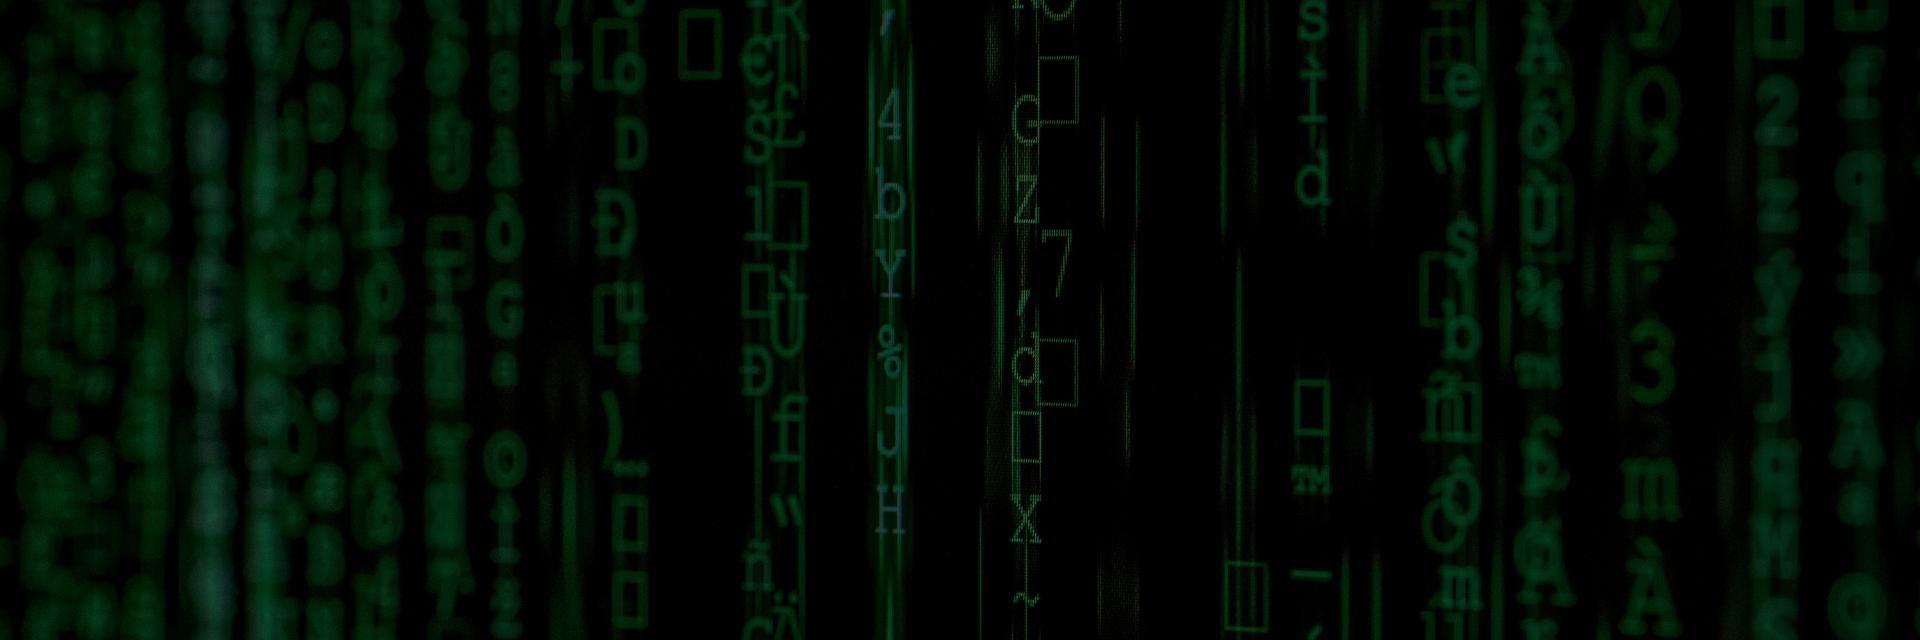 Forensic Malware Analysis